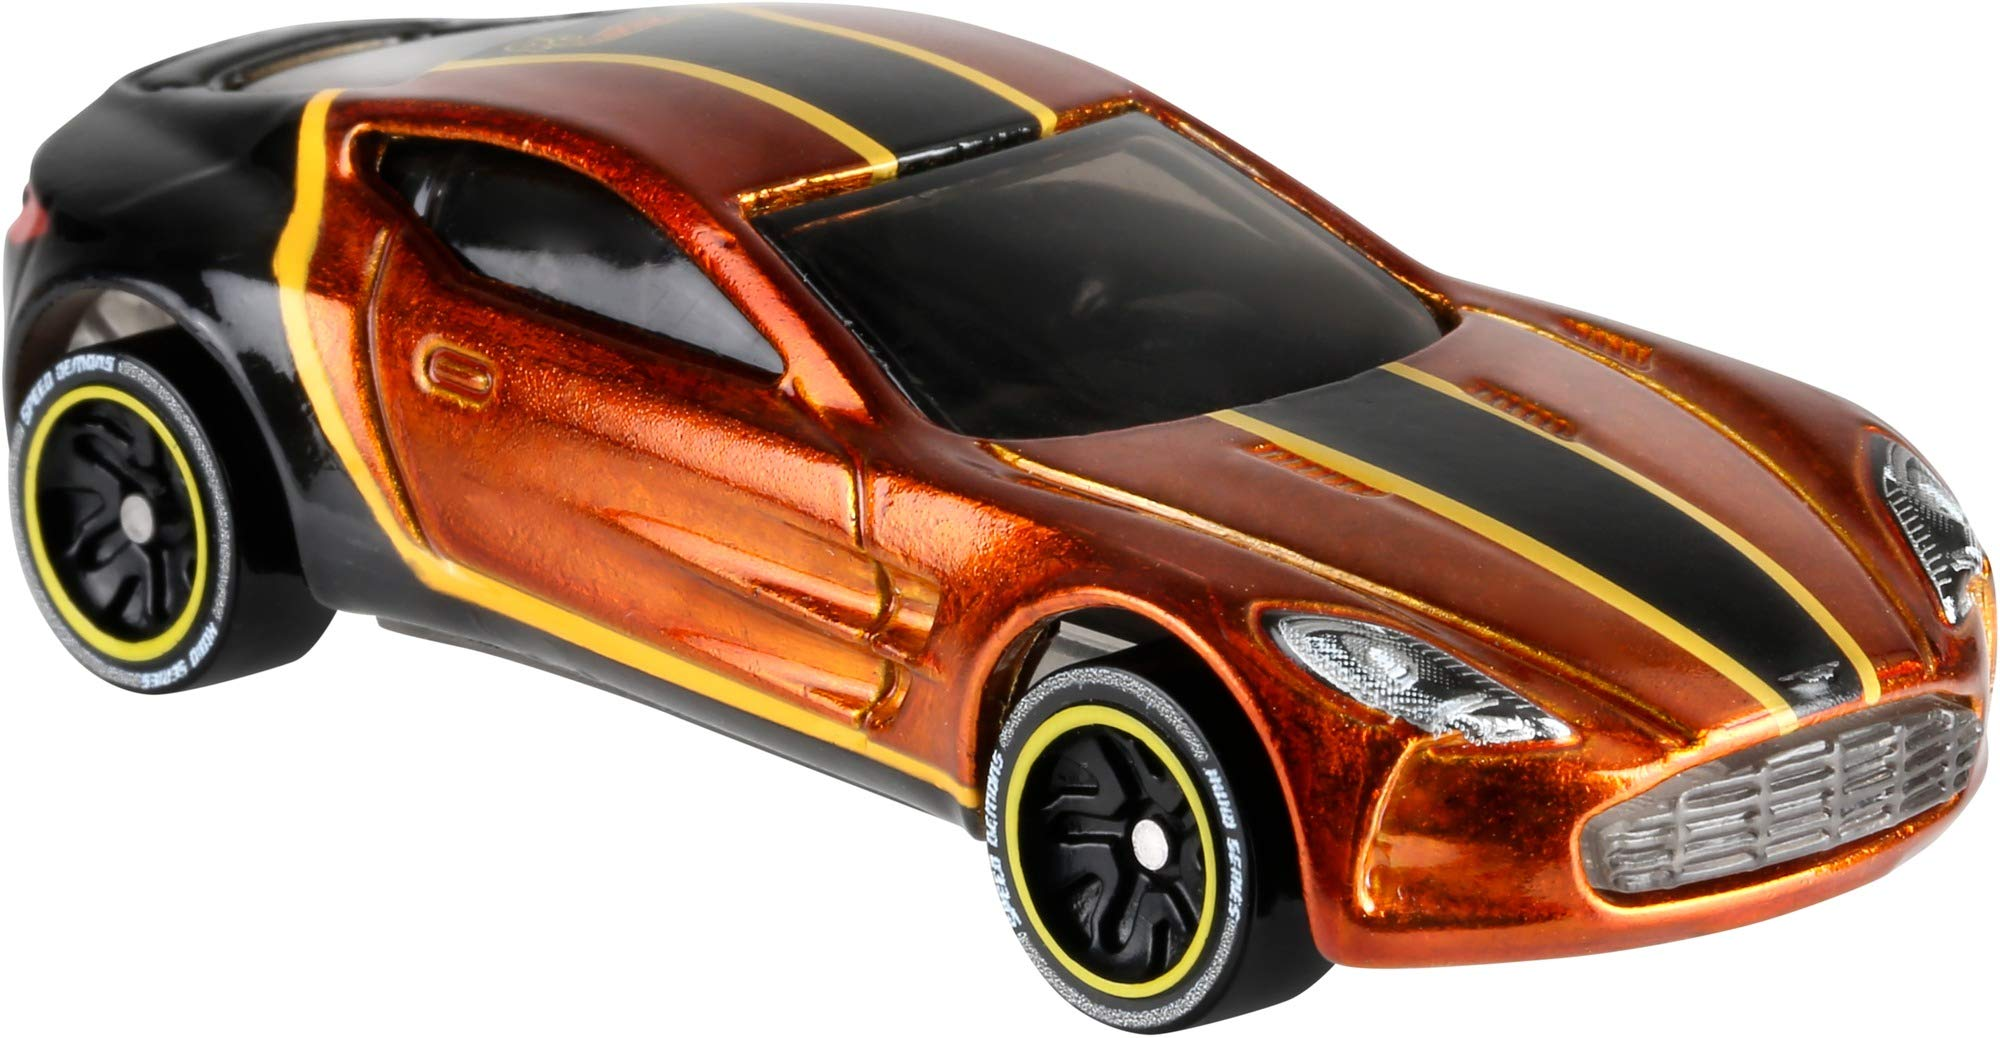 Hot Wheels ID Aston Martin One-77